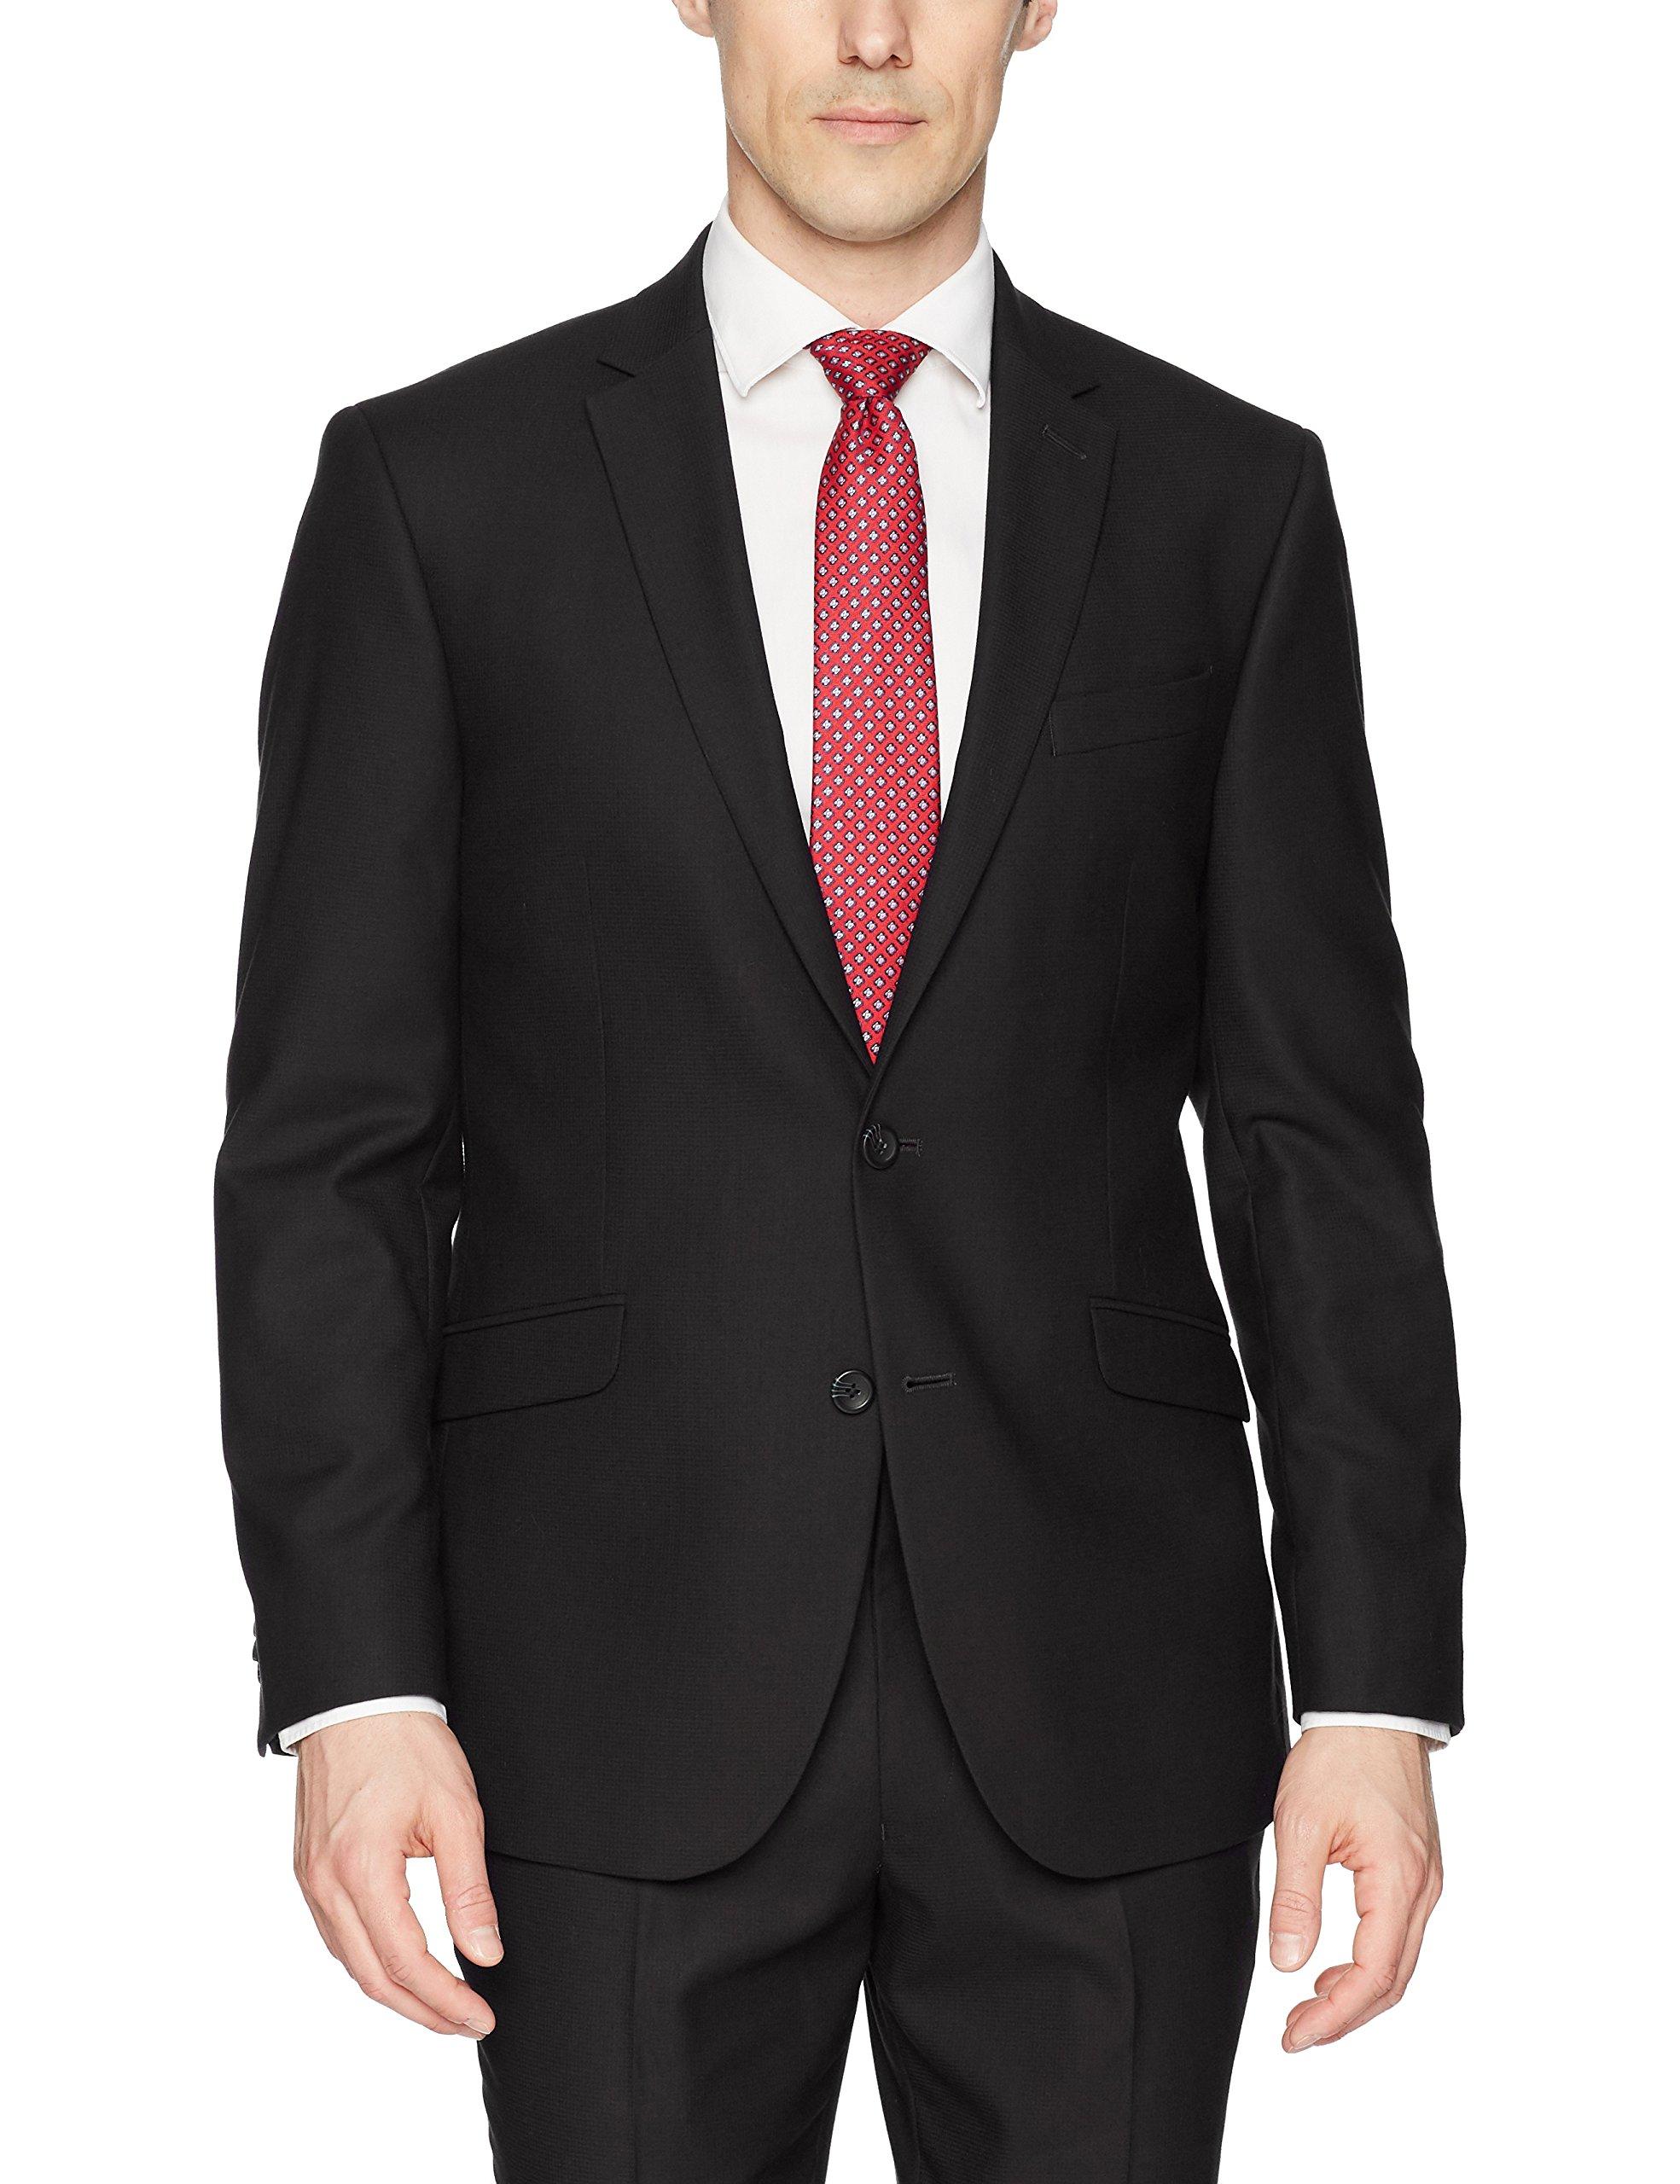 Kenneth Cole REACTION Men's Techni-Cole Stretch Slim Fit Suit Separate Blazer (Blazer, Pant, and Vest), Black, 46 Regular